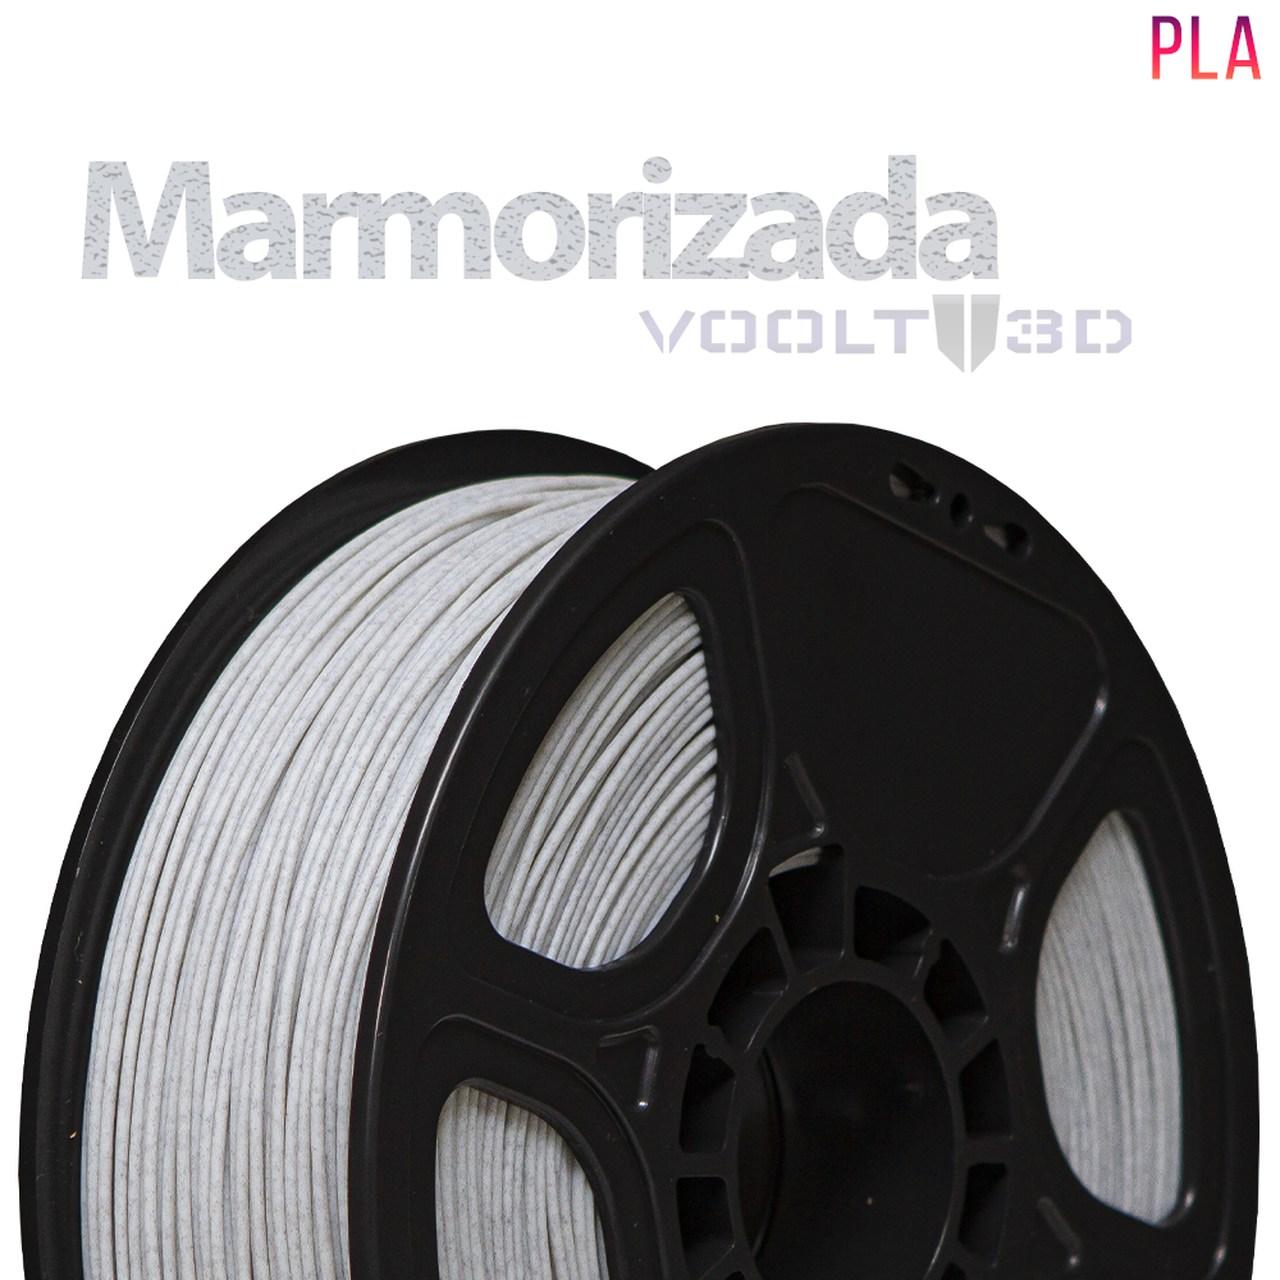 Filamento PLA - Marmorizado - Voolt - 1.75mm - 1kg